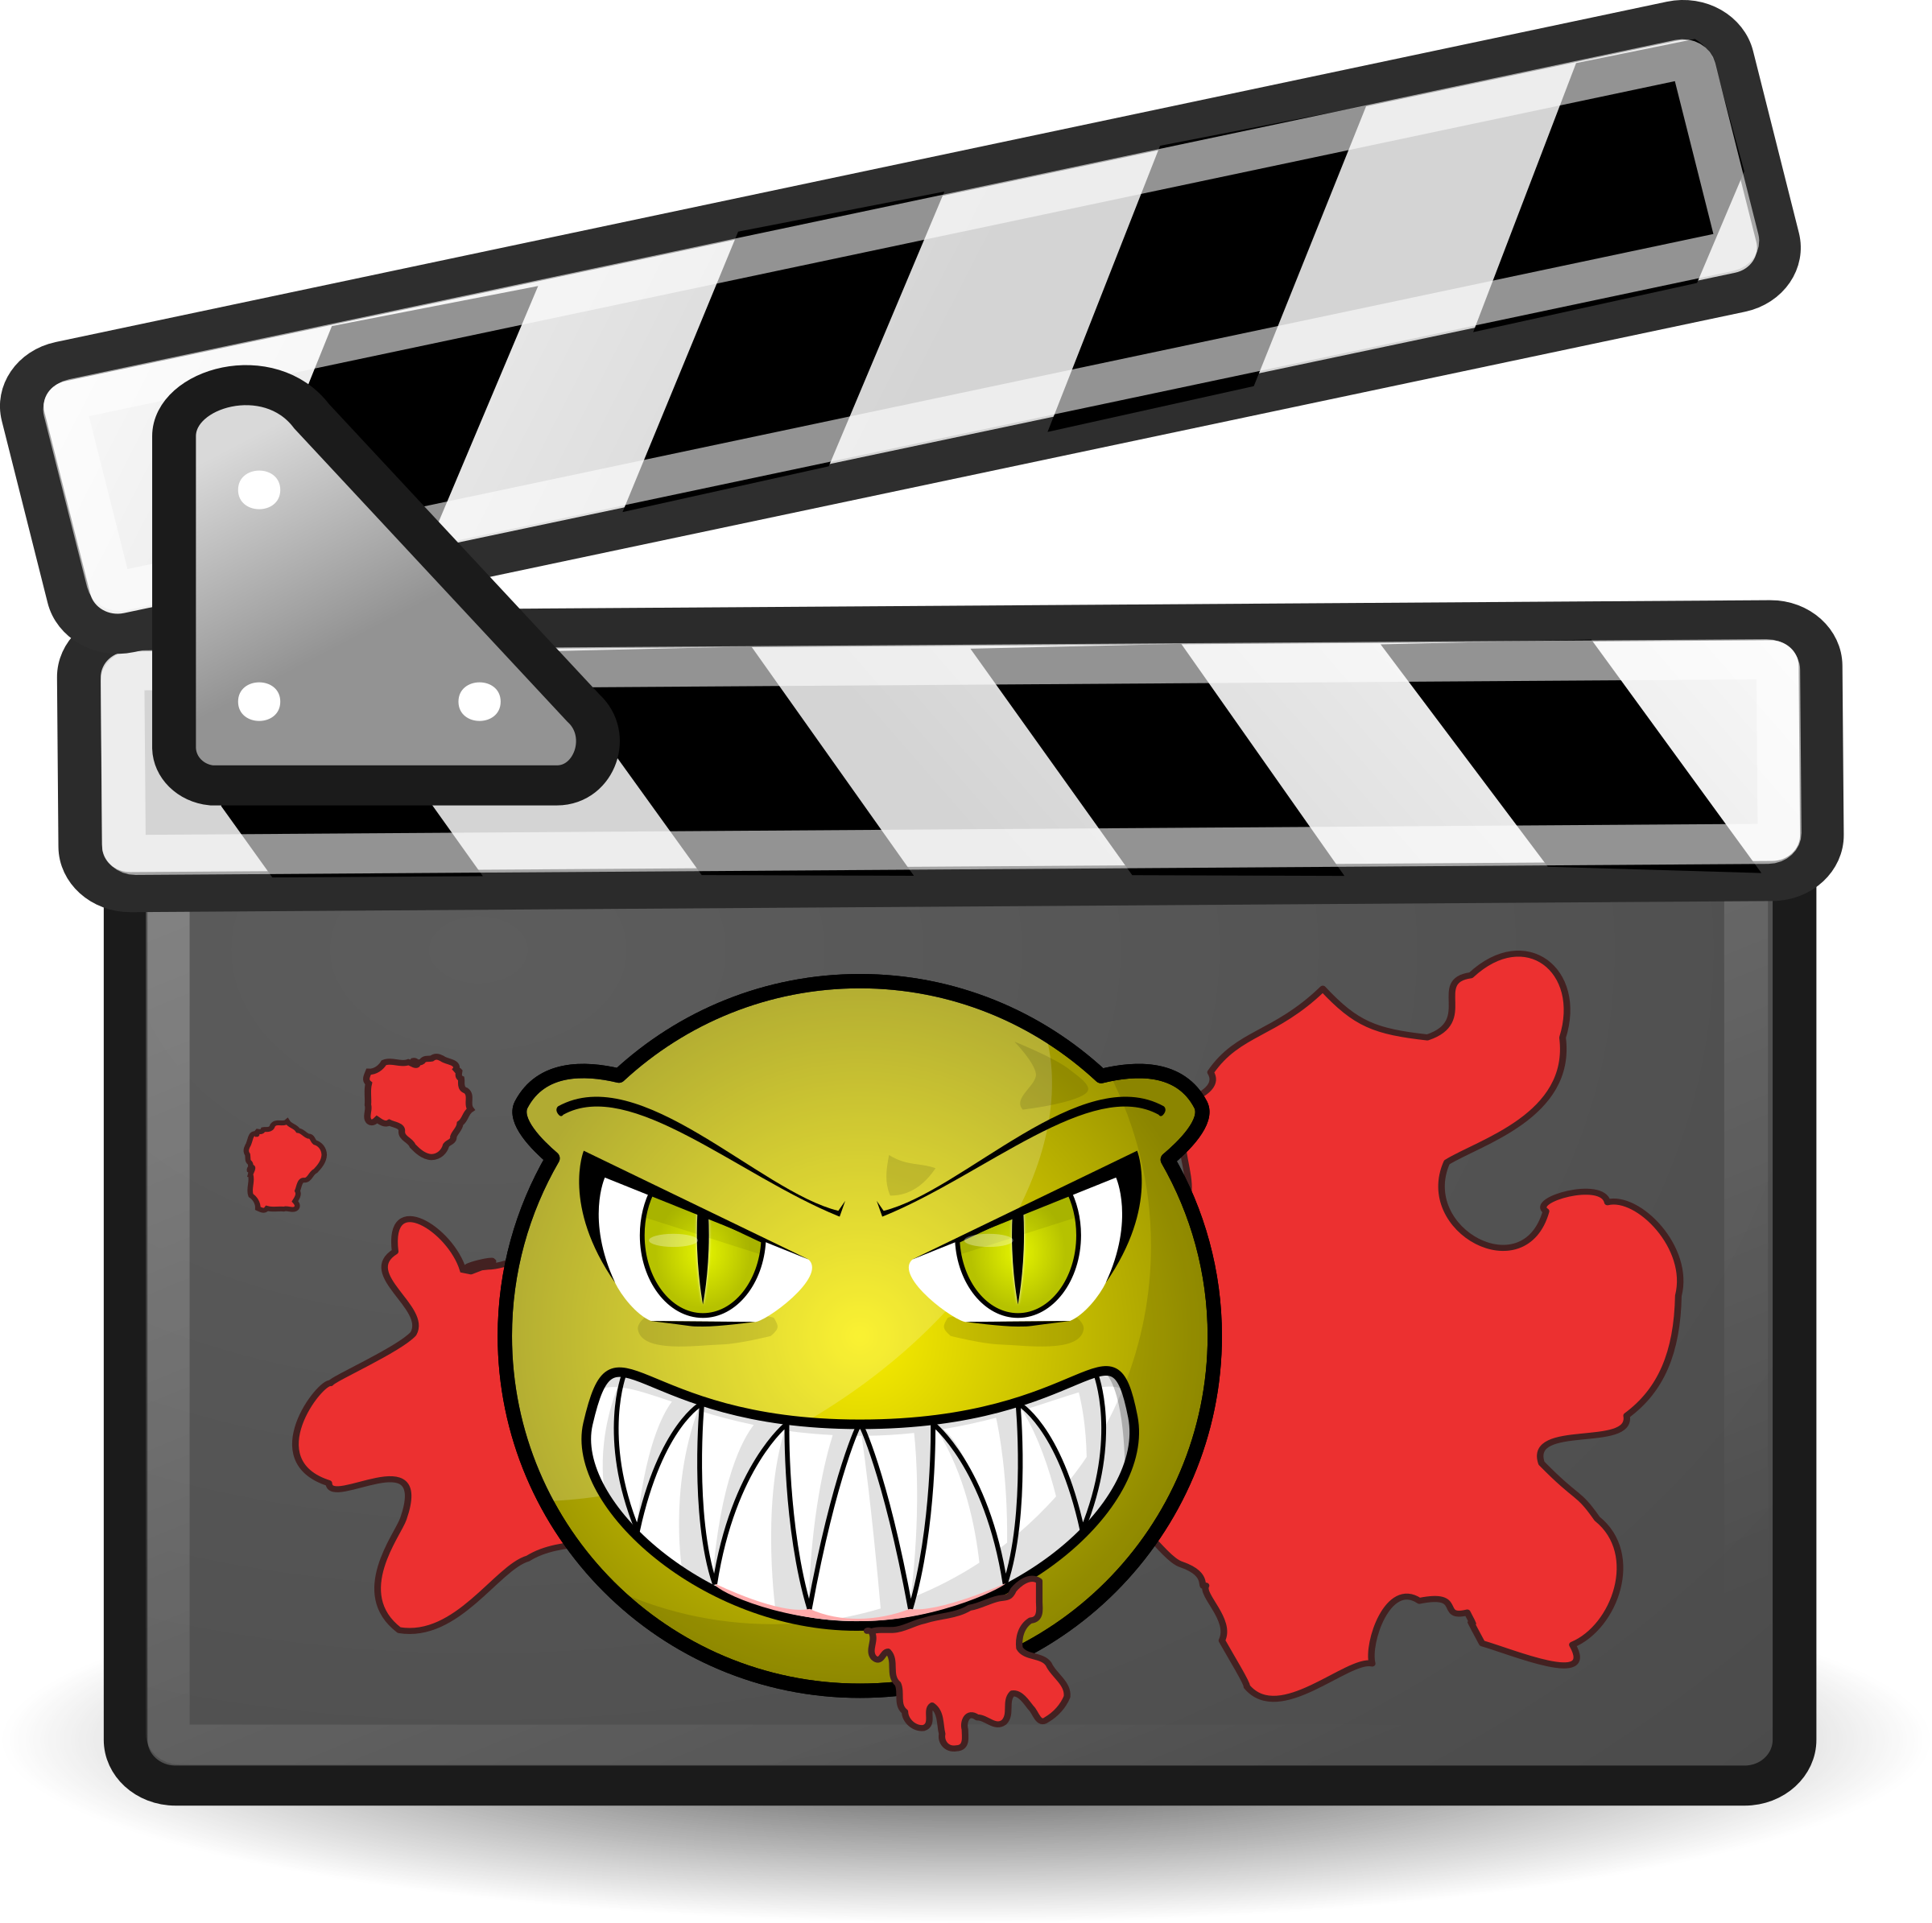 Movies clipart movie symbol, Movies movie symbol Transparent FREE.